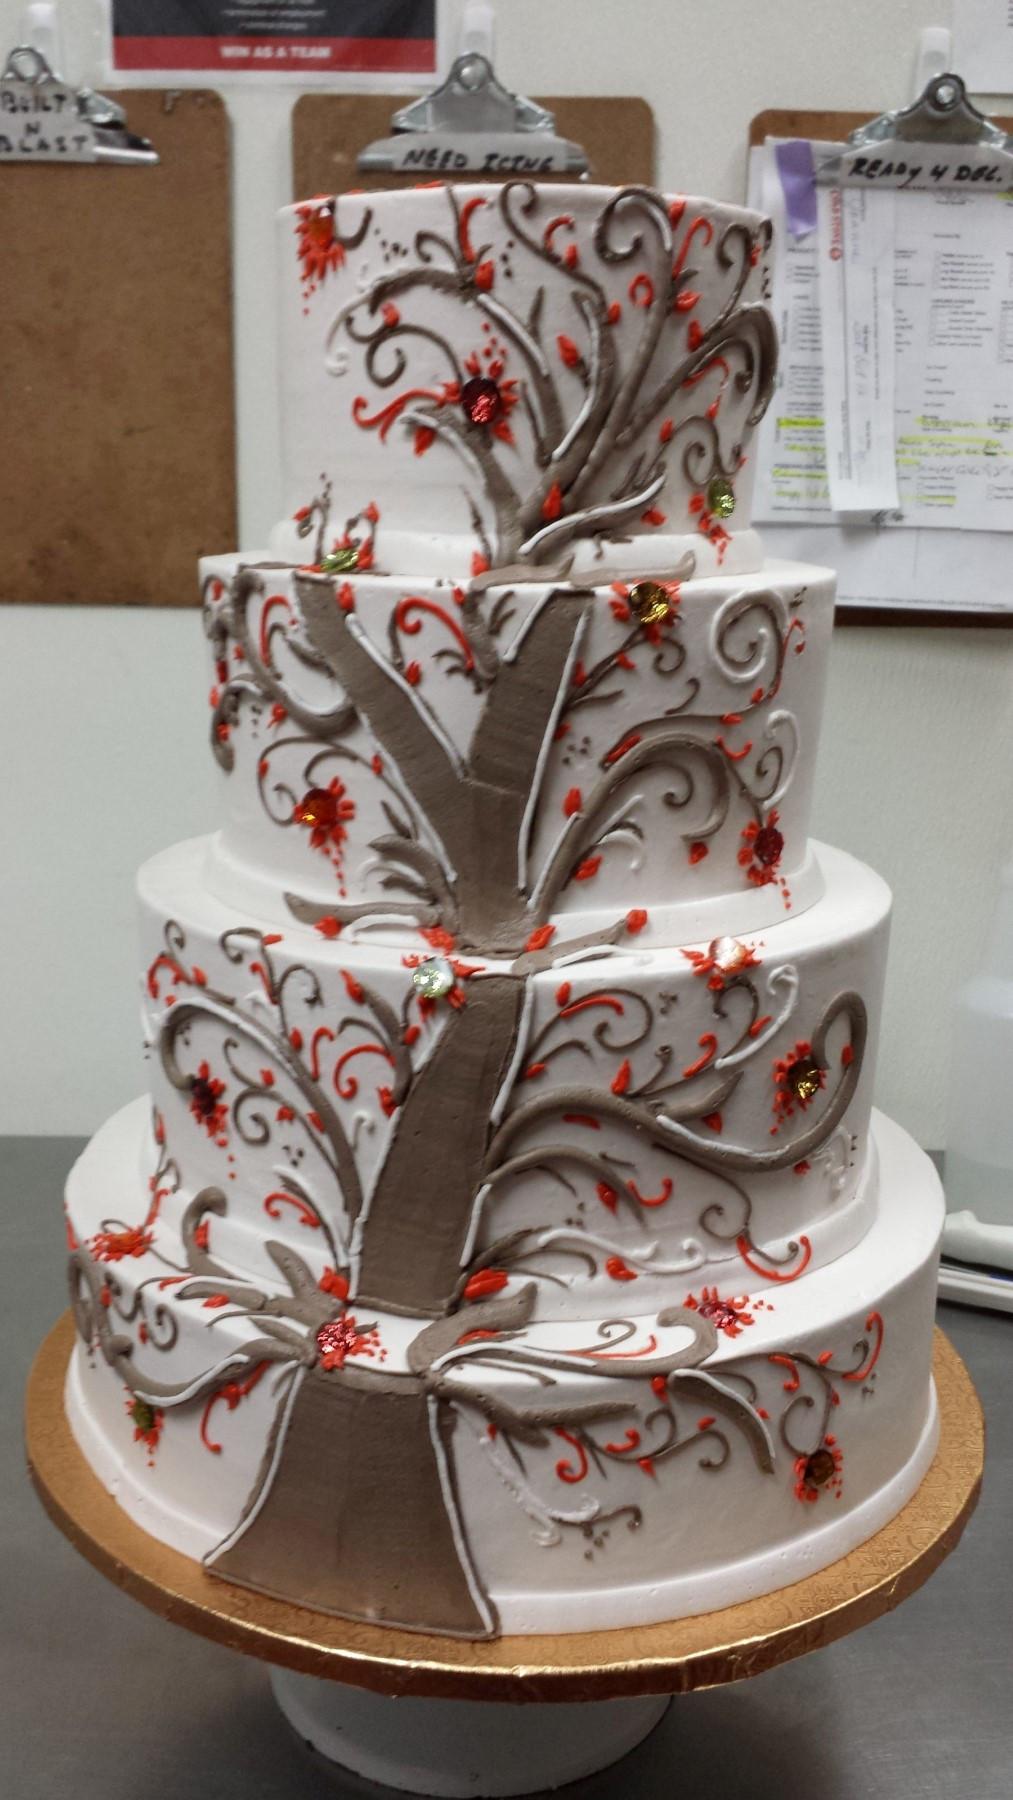 Wedding Cakes Rancho Cucamonga  Wedding Cakes Custom Cake Decorations Donuts Pastries